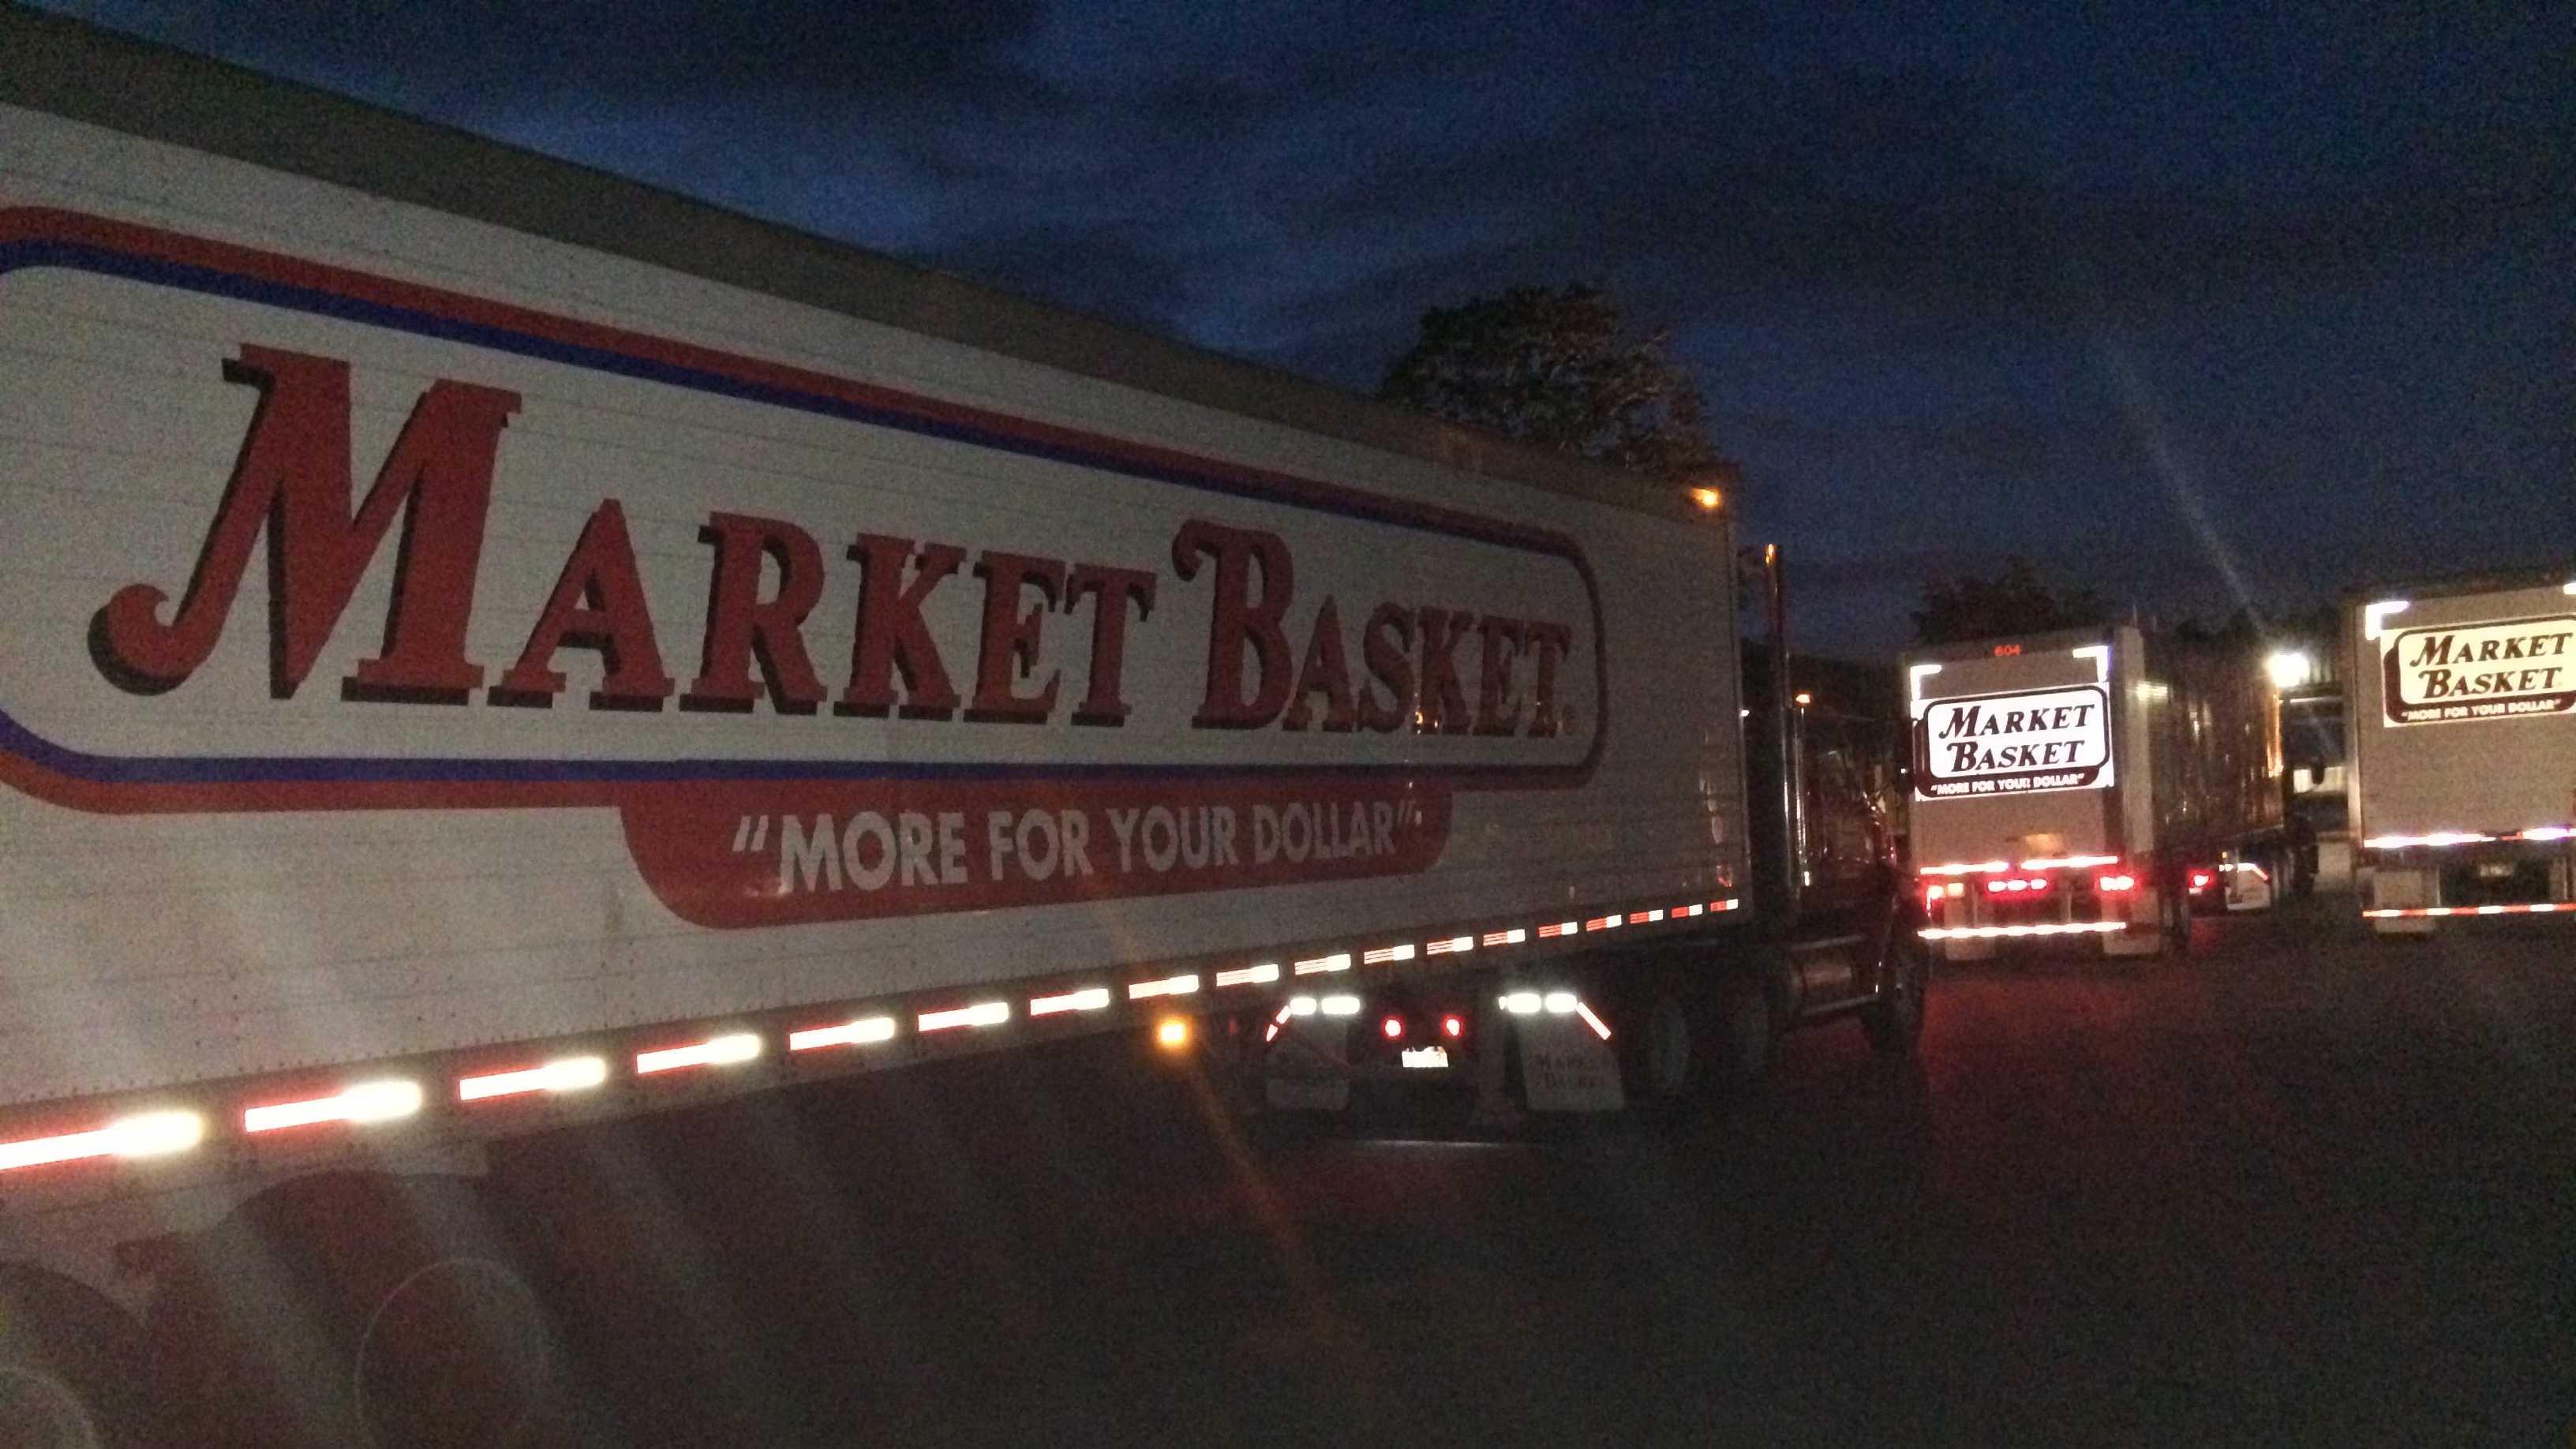 Market Basket trucks